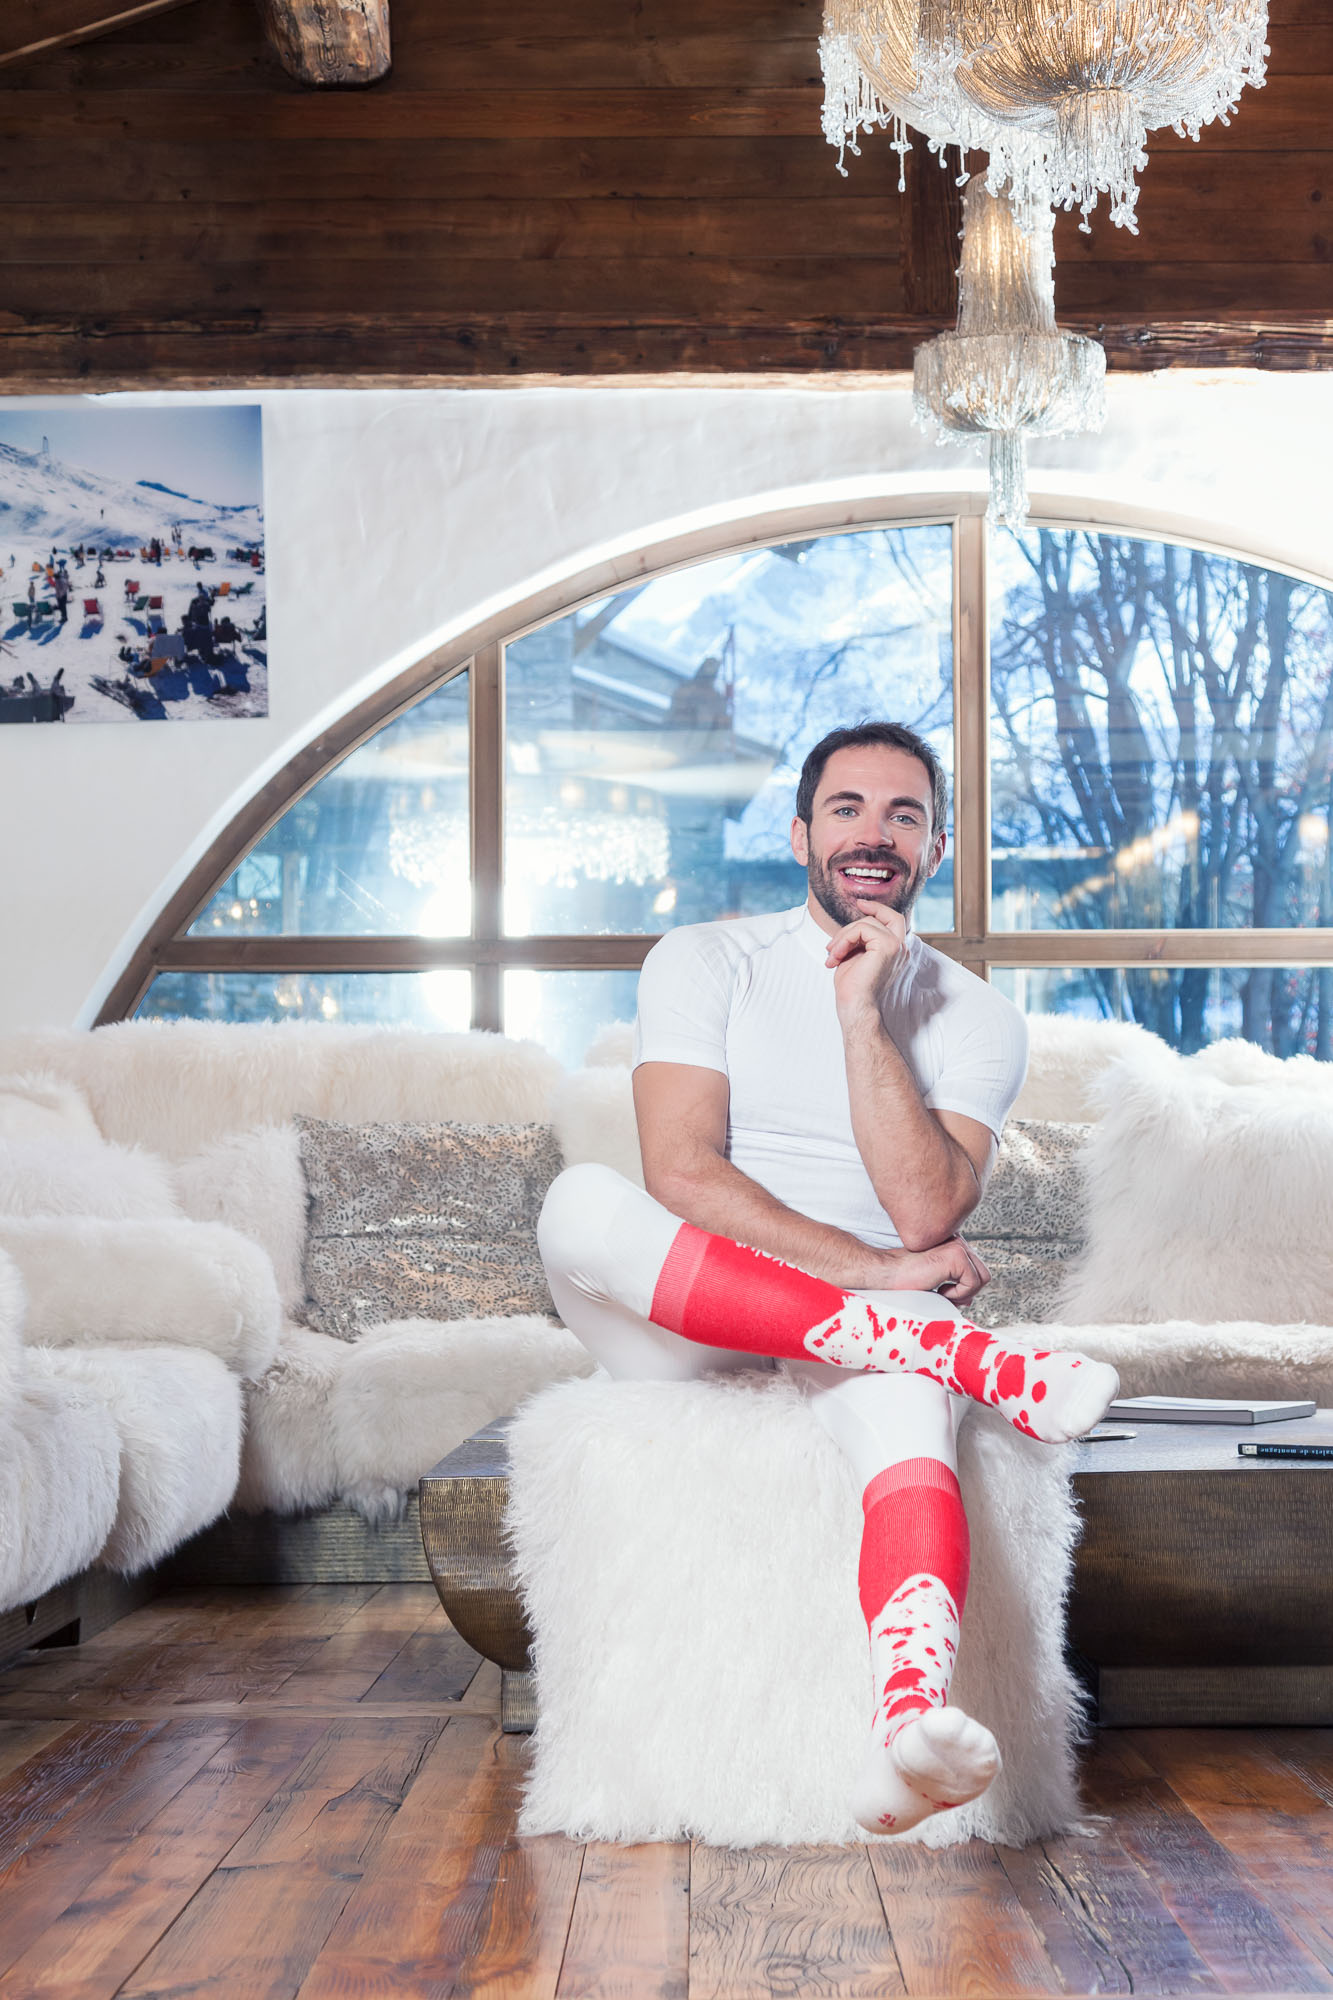 Gauthier DE TESSIERES - Skieur alpin